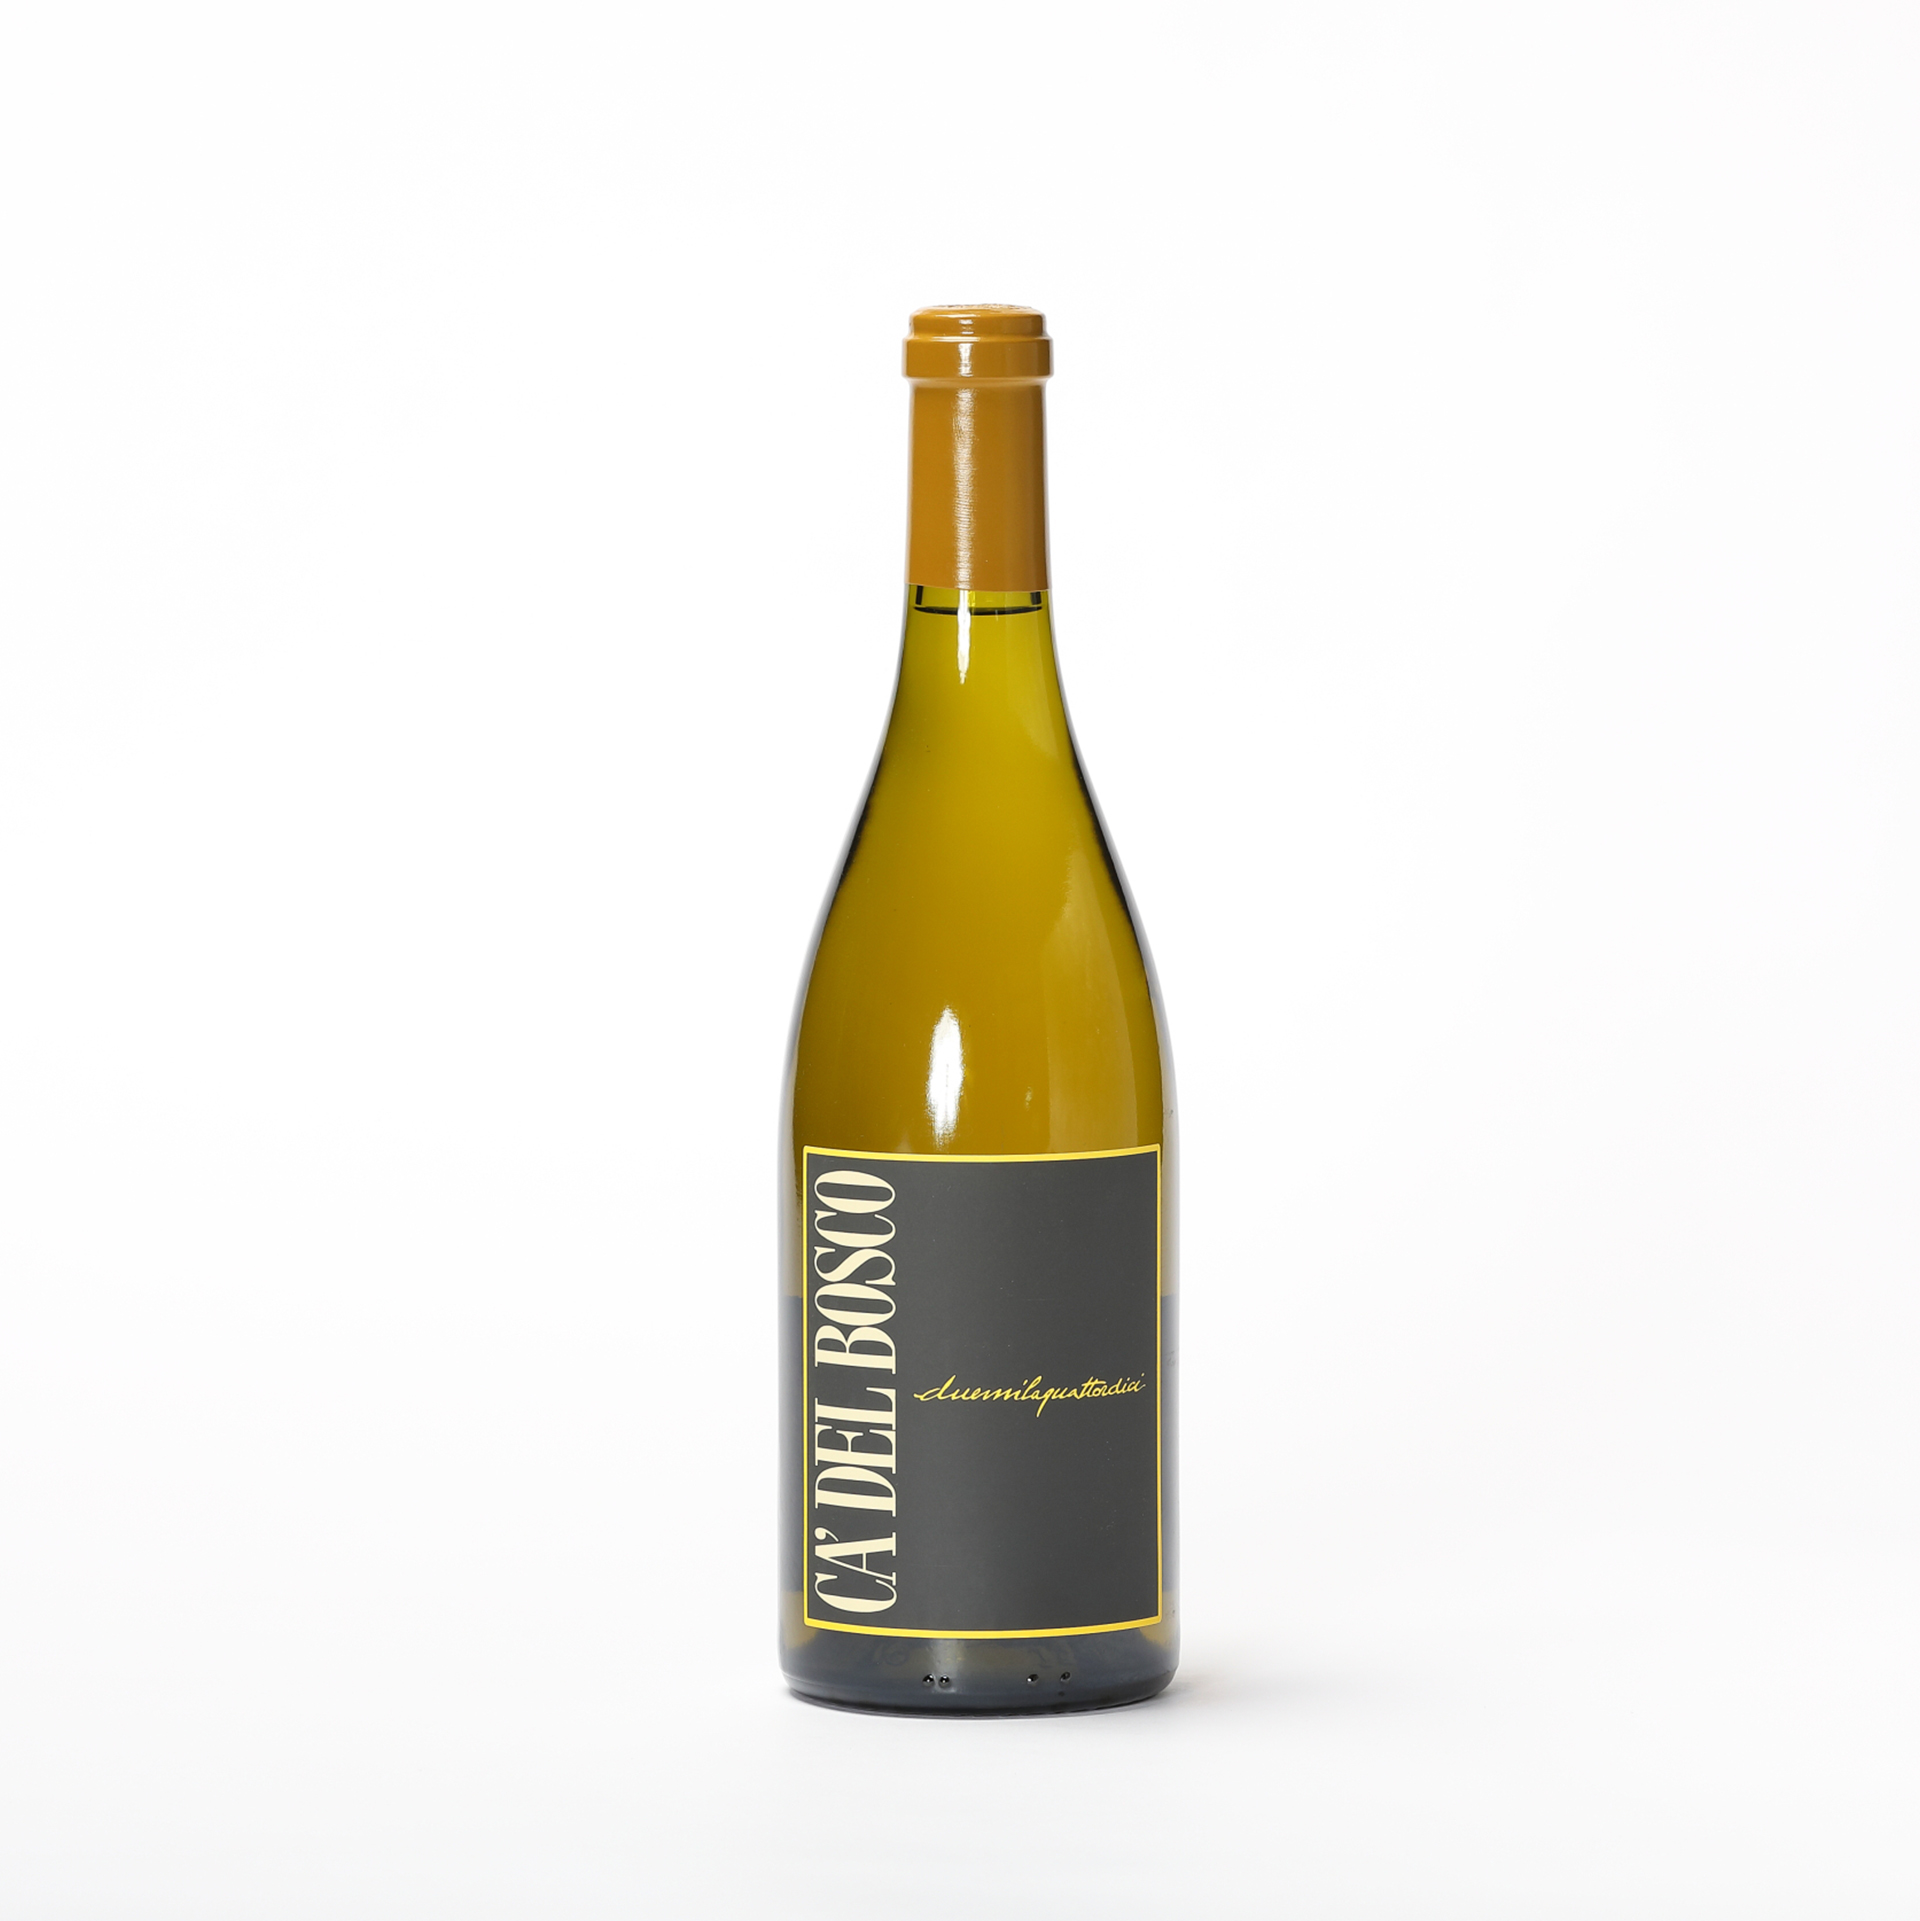 Curtefranca DOC Chardonnay 2015 - Weingut Ca` del Bosco